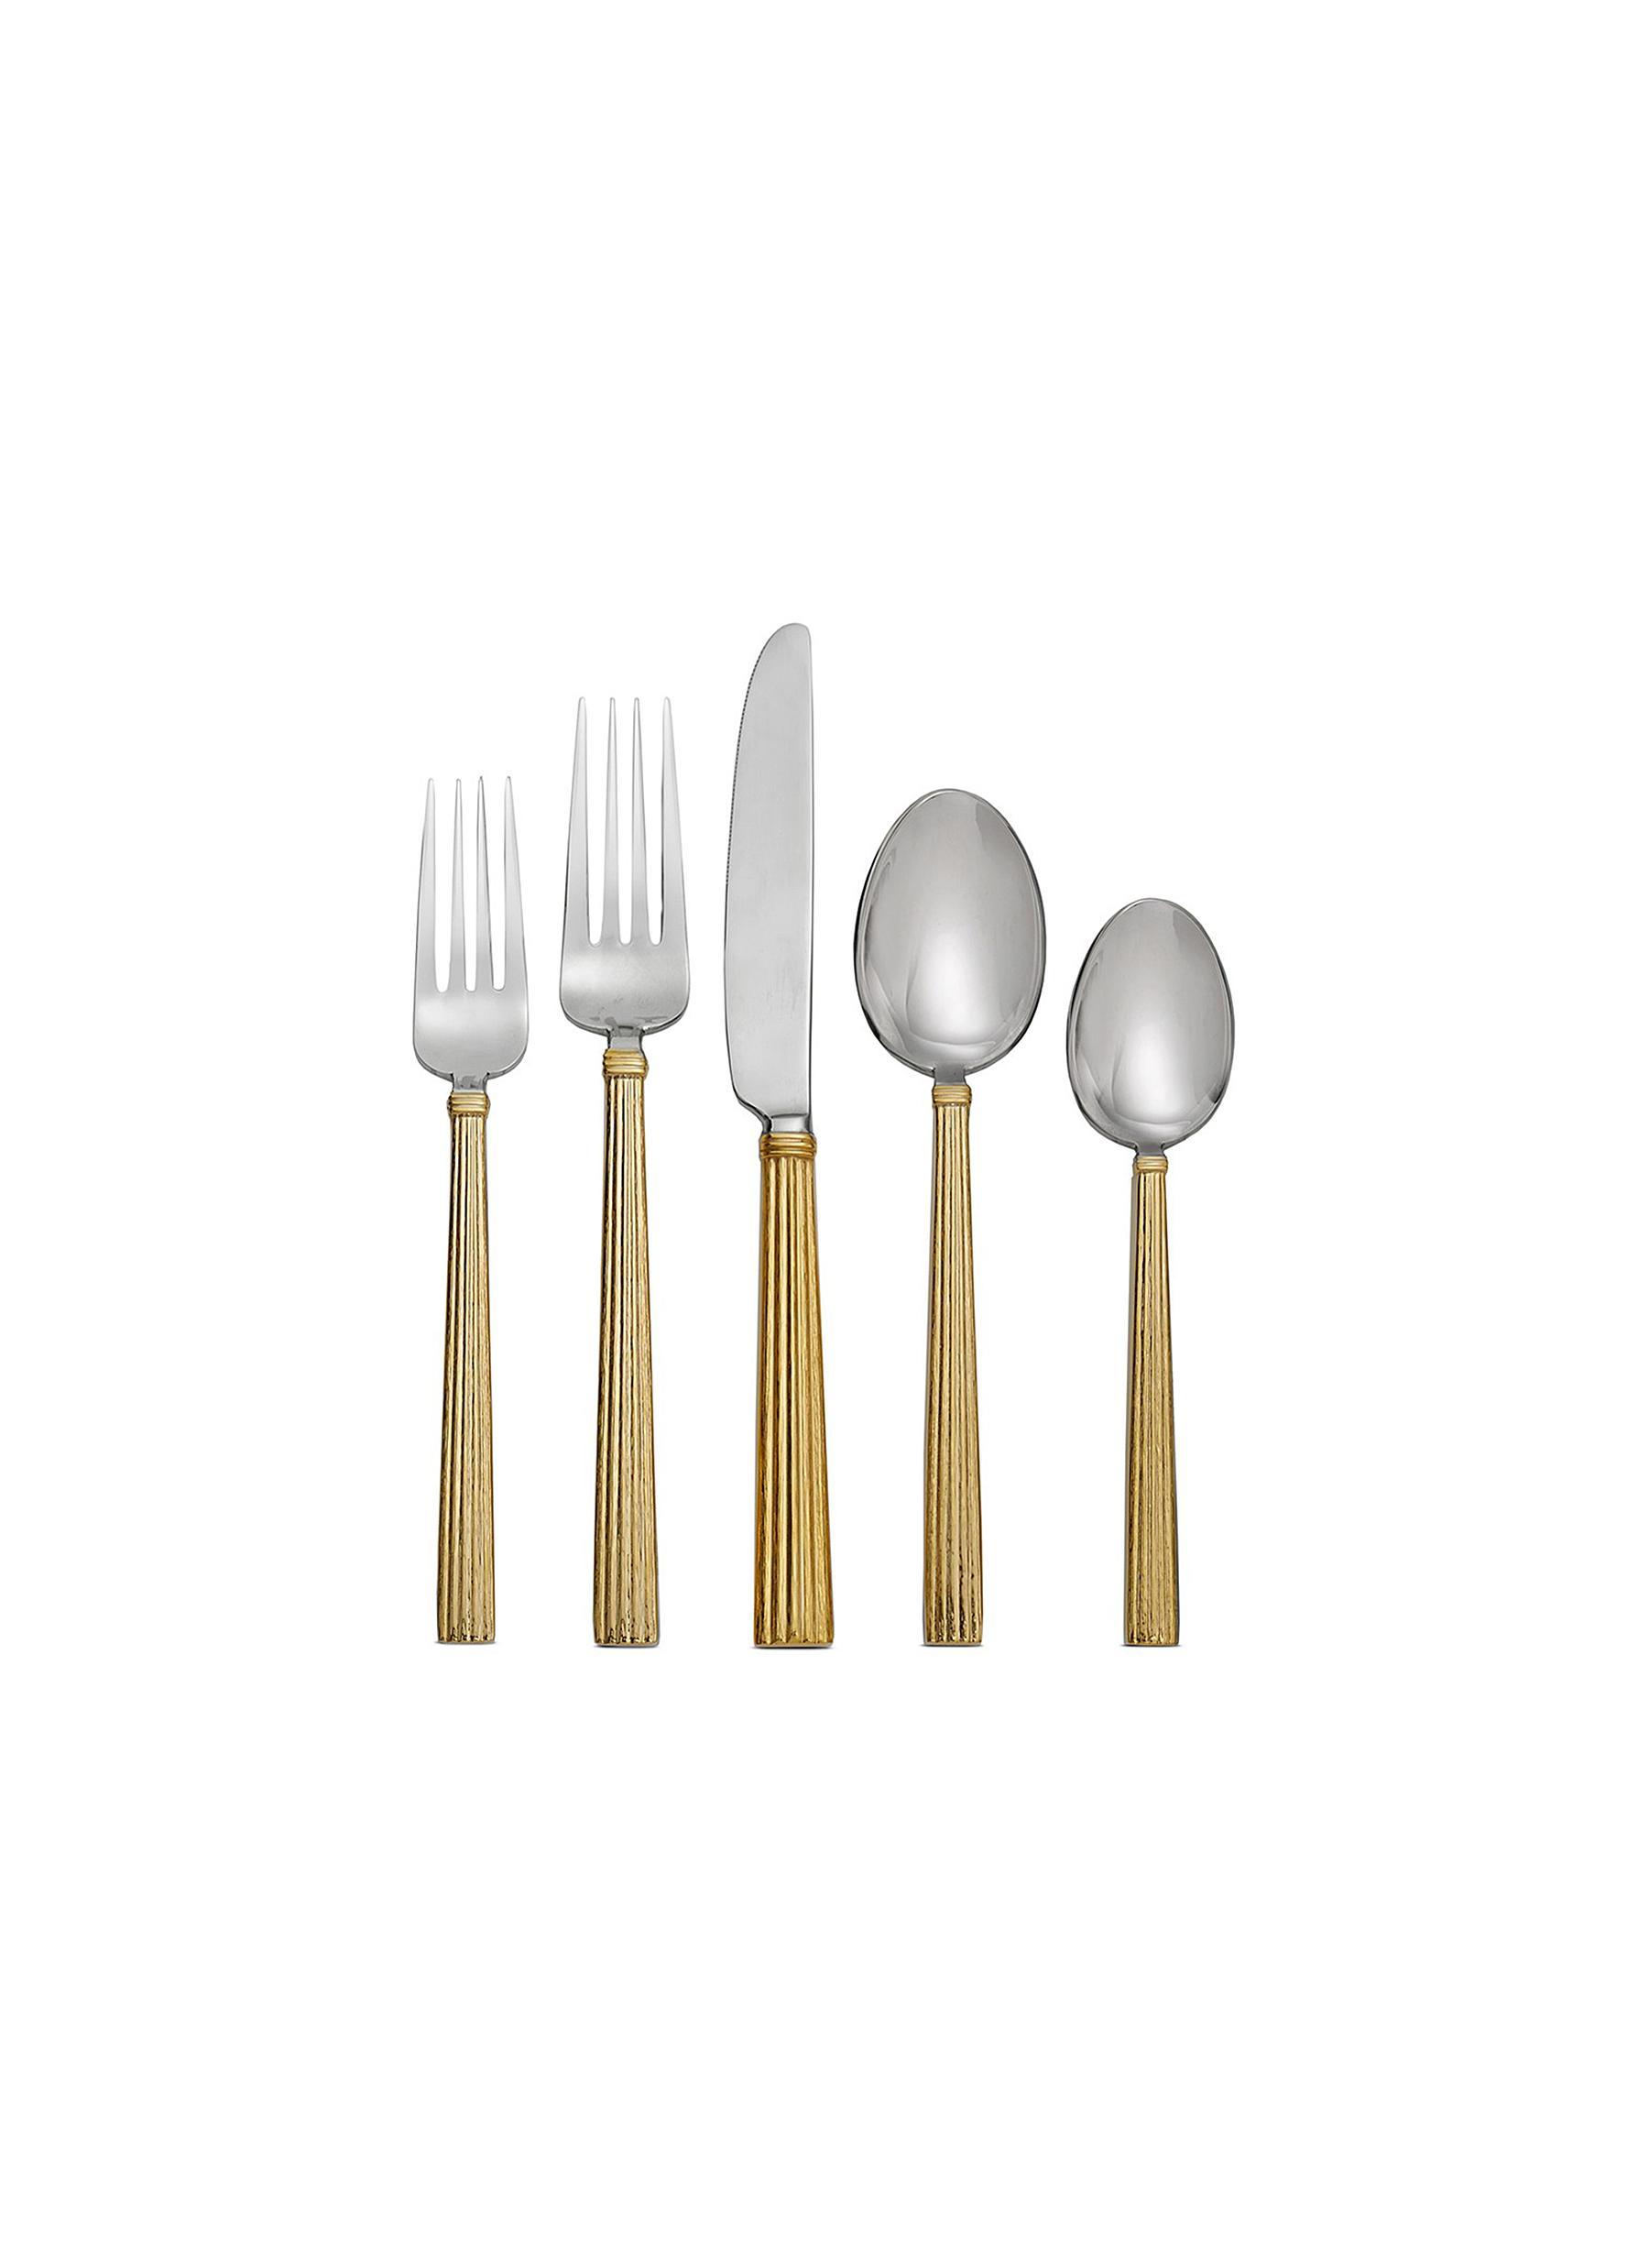 Wheat 5-piece flatware set by Michael Aram